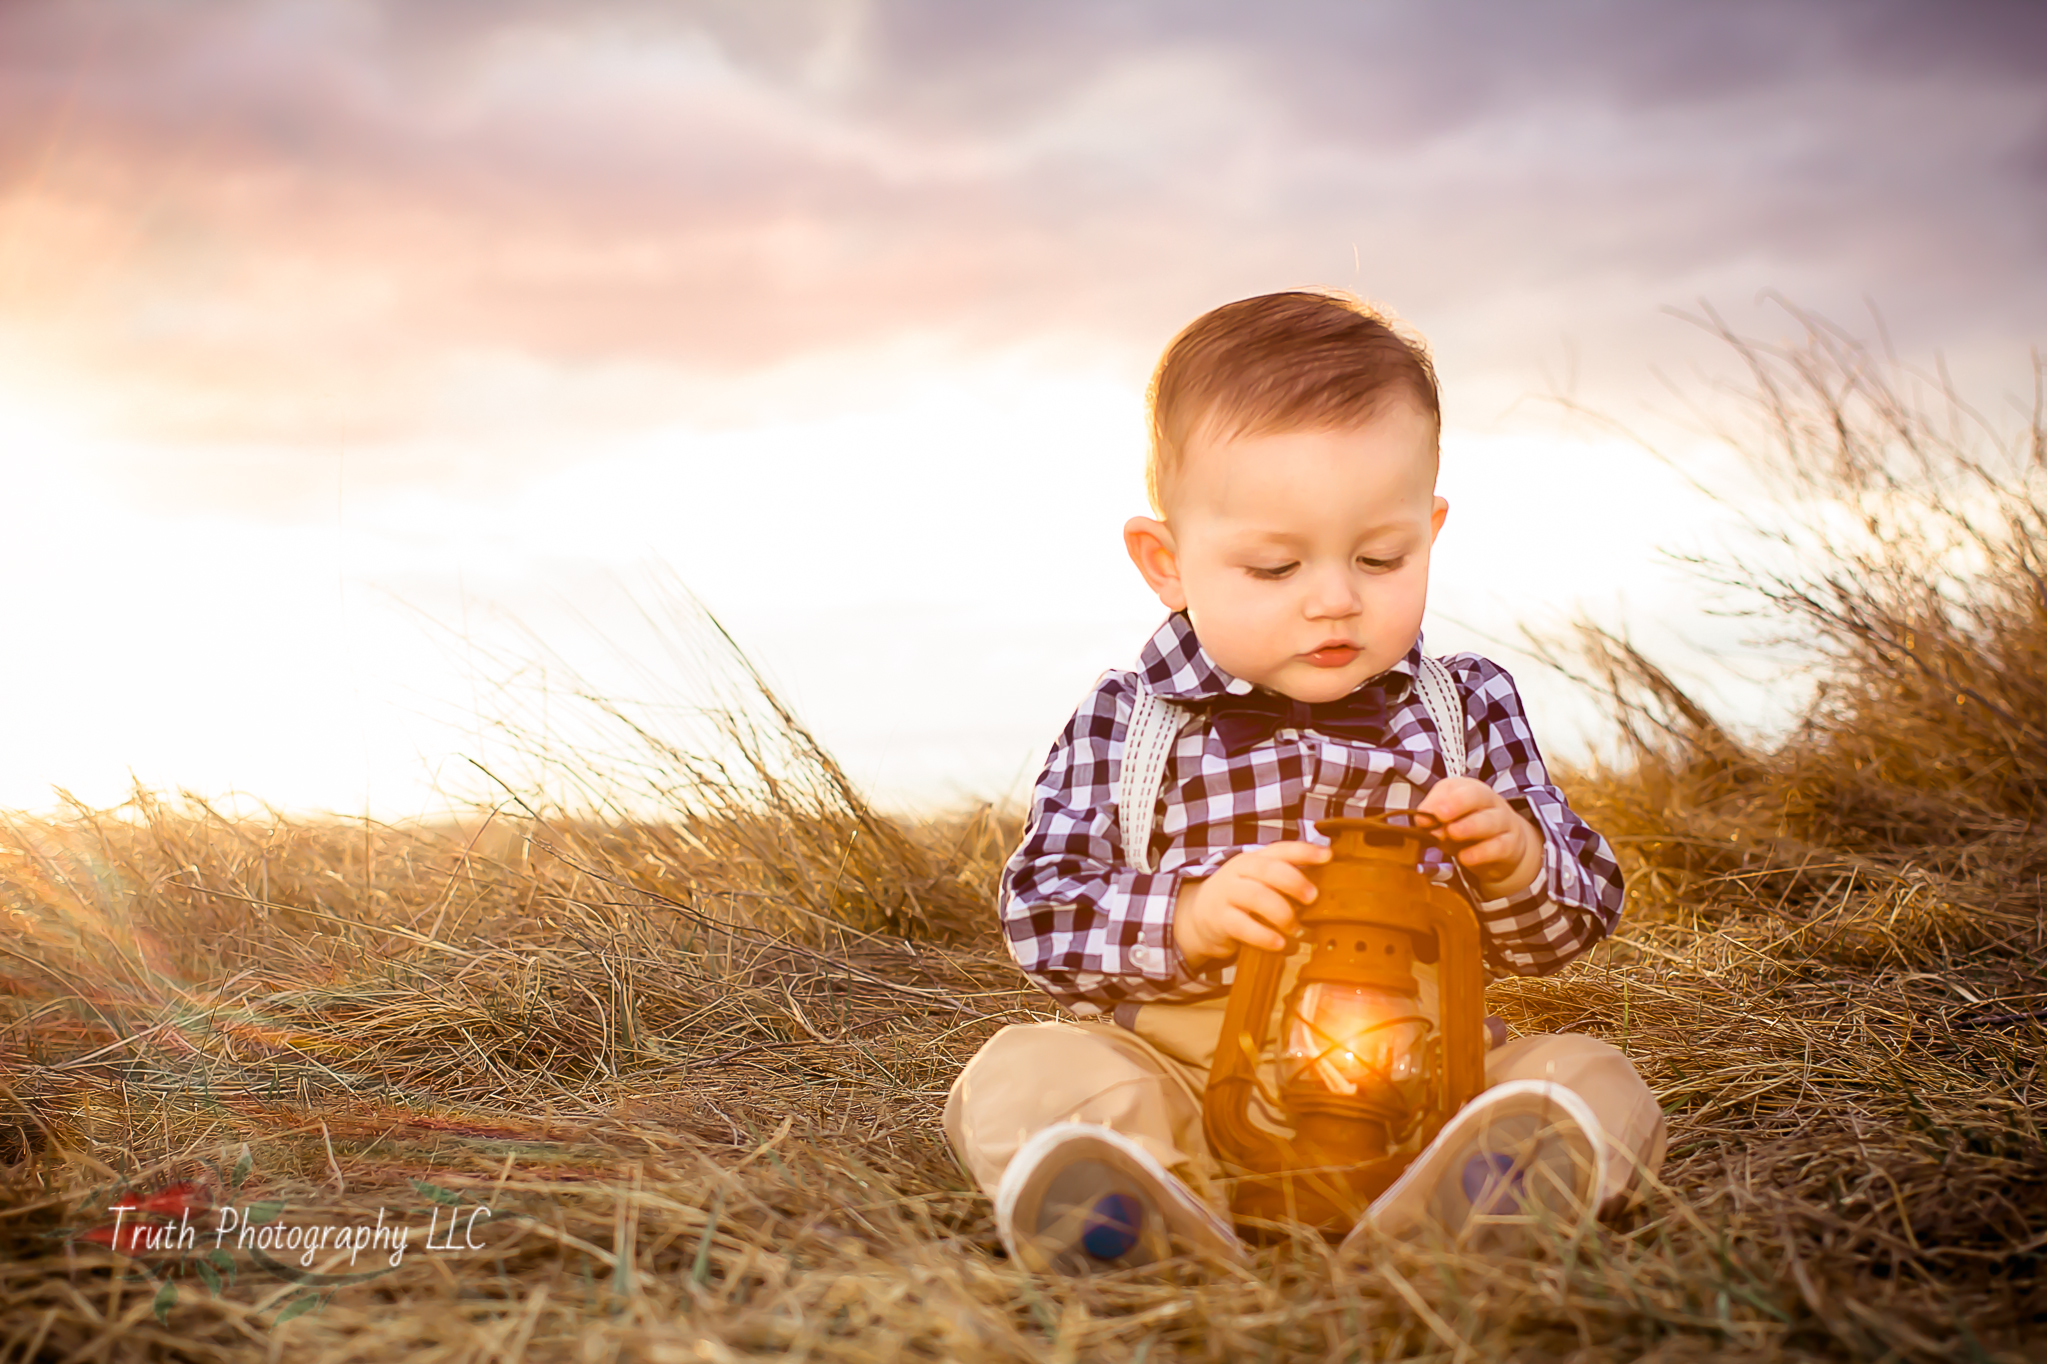 Truth-Photography-Thornton-CO-baby-portraits.jpg